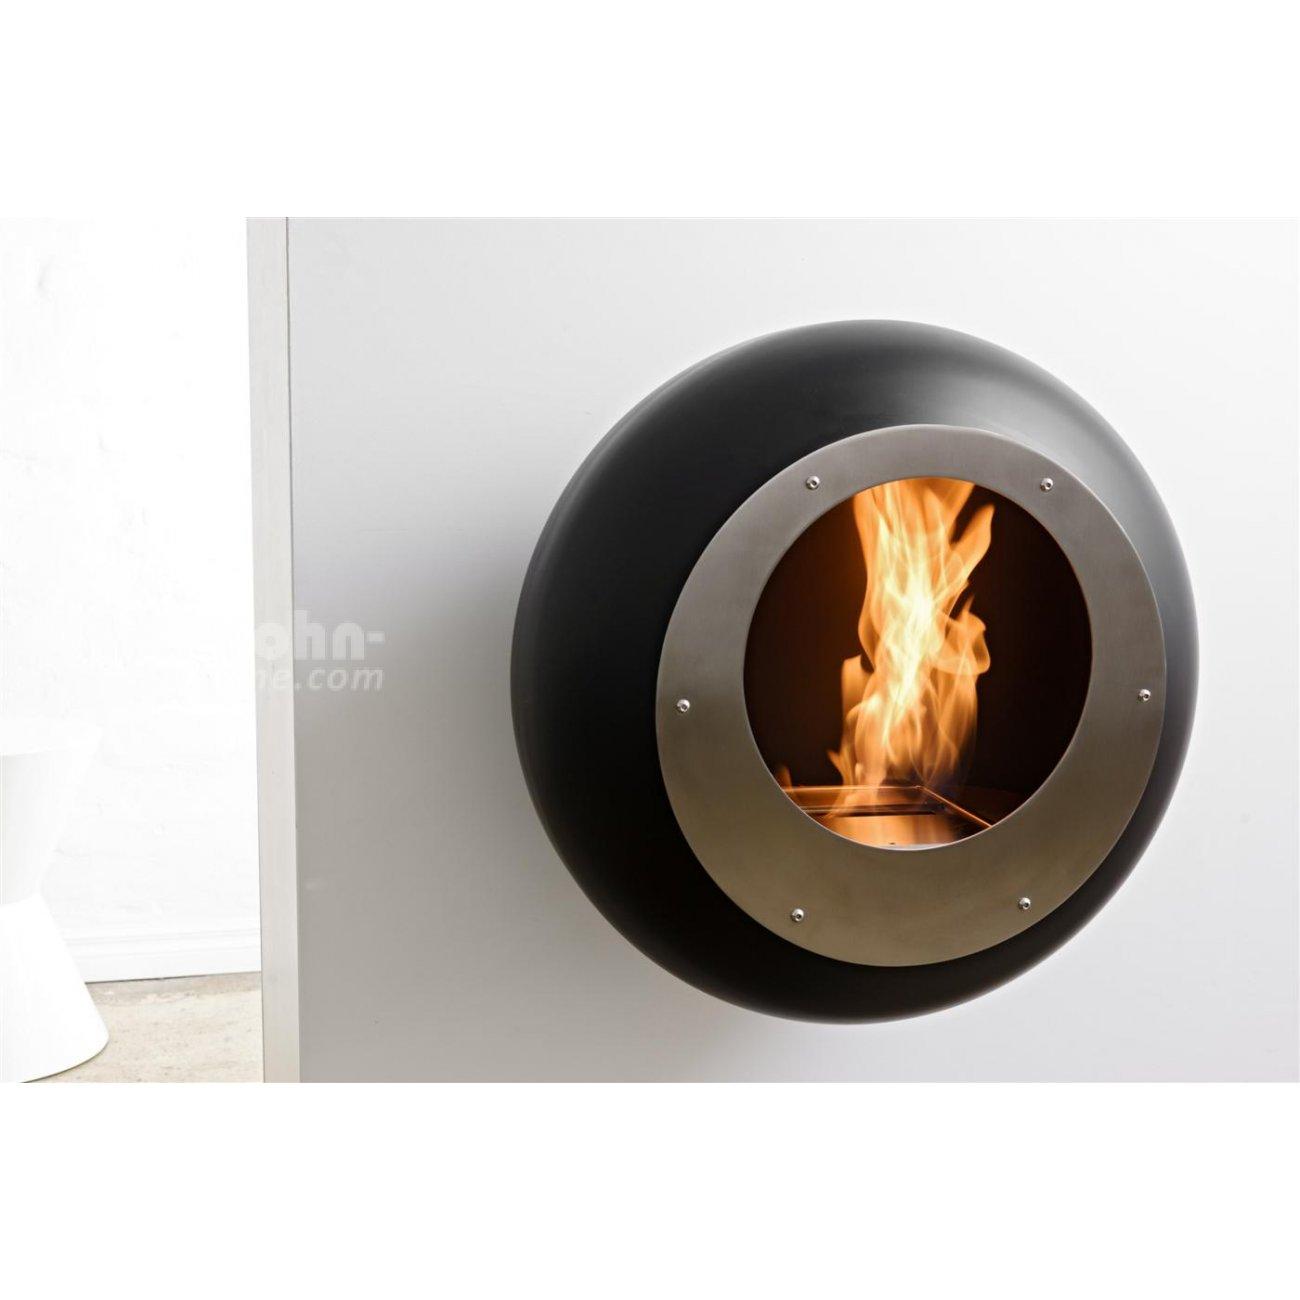 cocoon wandkamin vellum mit ethanol. Black Bedroom Furniture Sets. Home Design Ideas